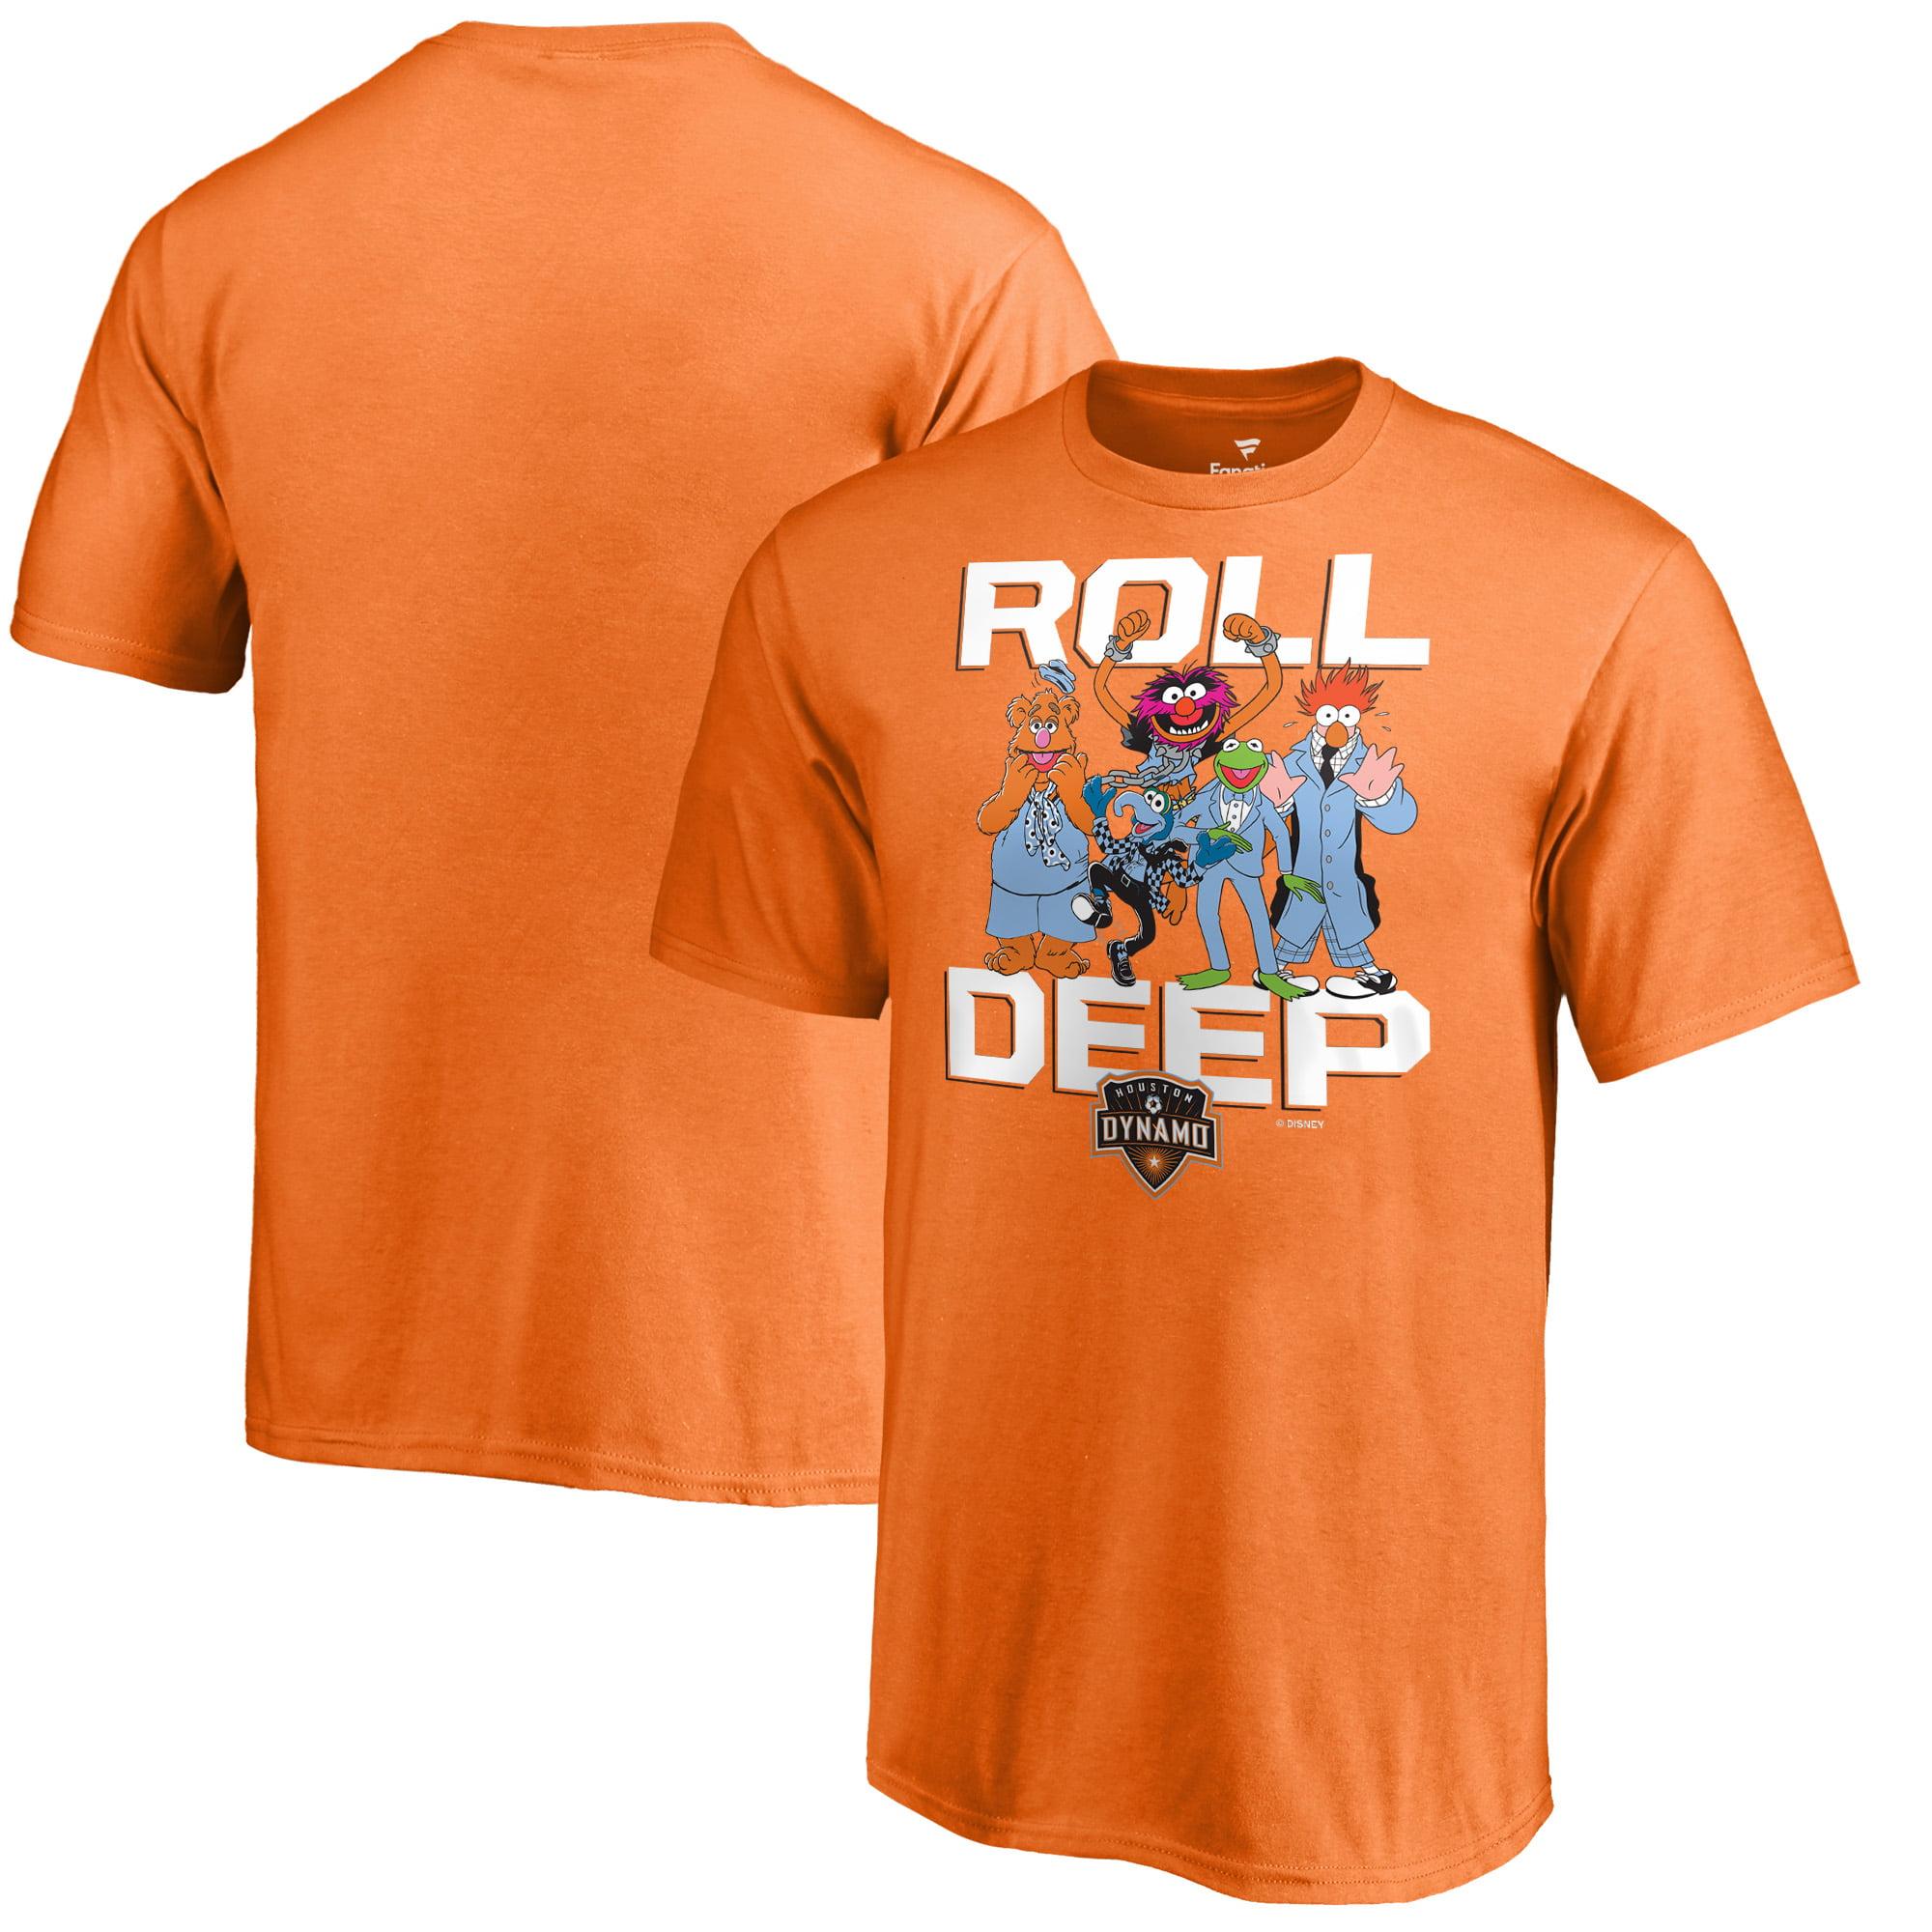 Houston Dynamo Fanatics Branded Youth Disney Roll Deep Muppets T-Shirt - Orange